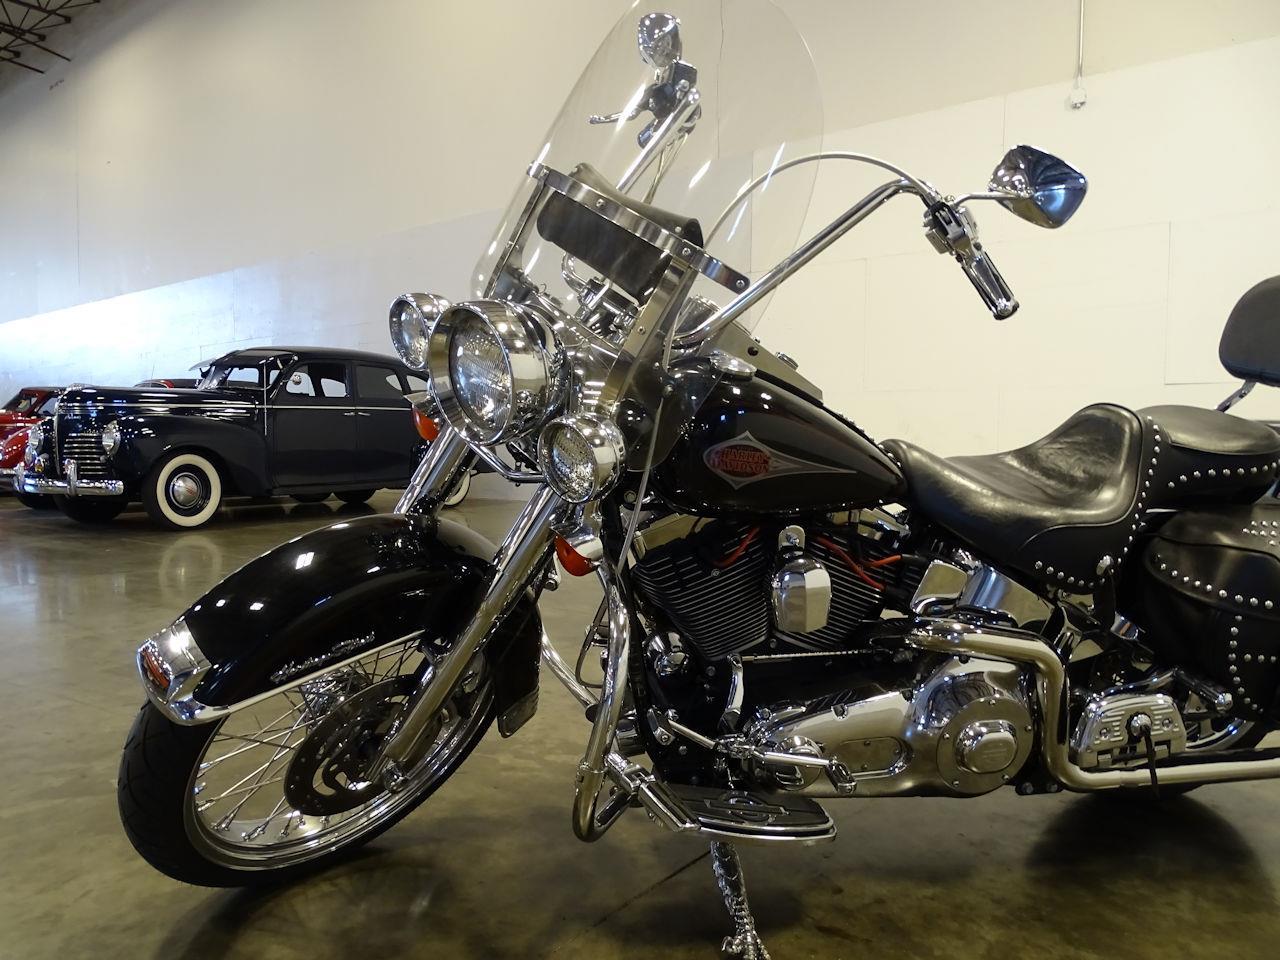 2001 Harley-Davidson Heritage Softail Classic (CC-1351674) for sale in O'Fallon, Illinois